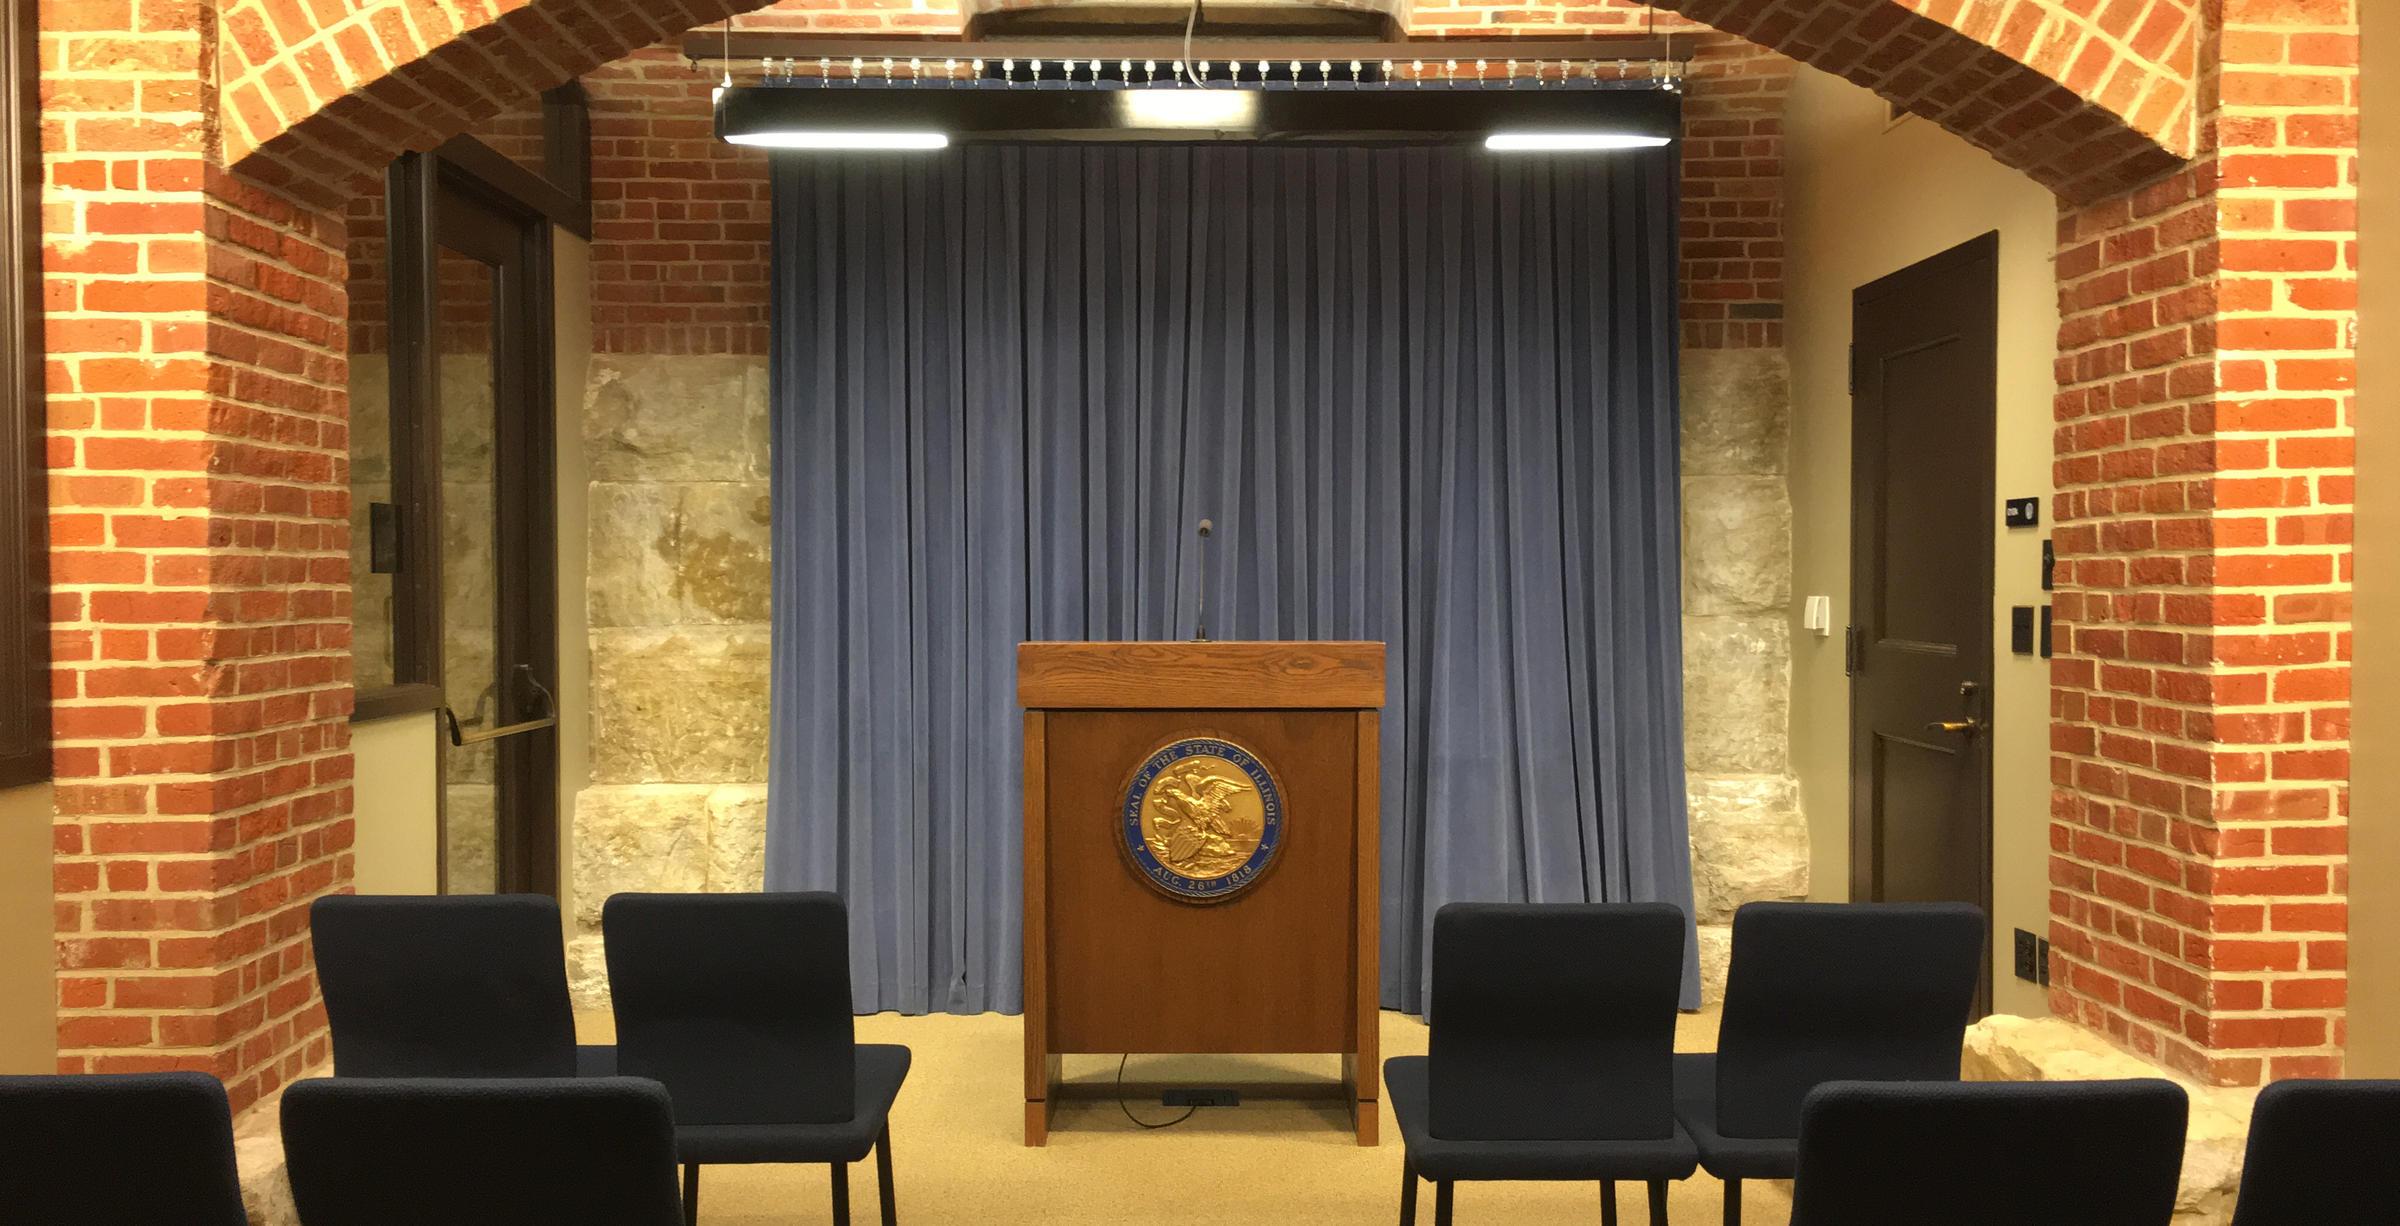 Radogno sends shockwave with sudden resignation from Senate